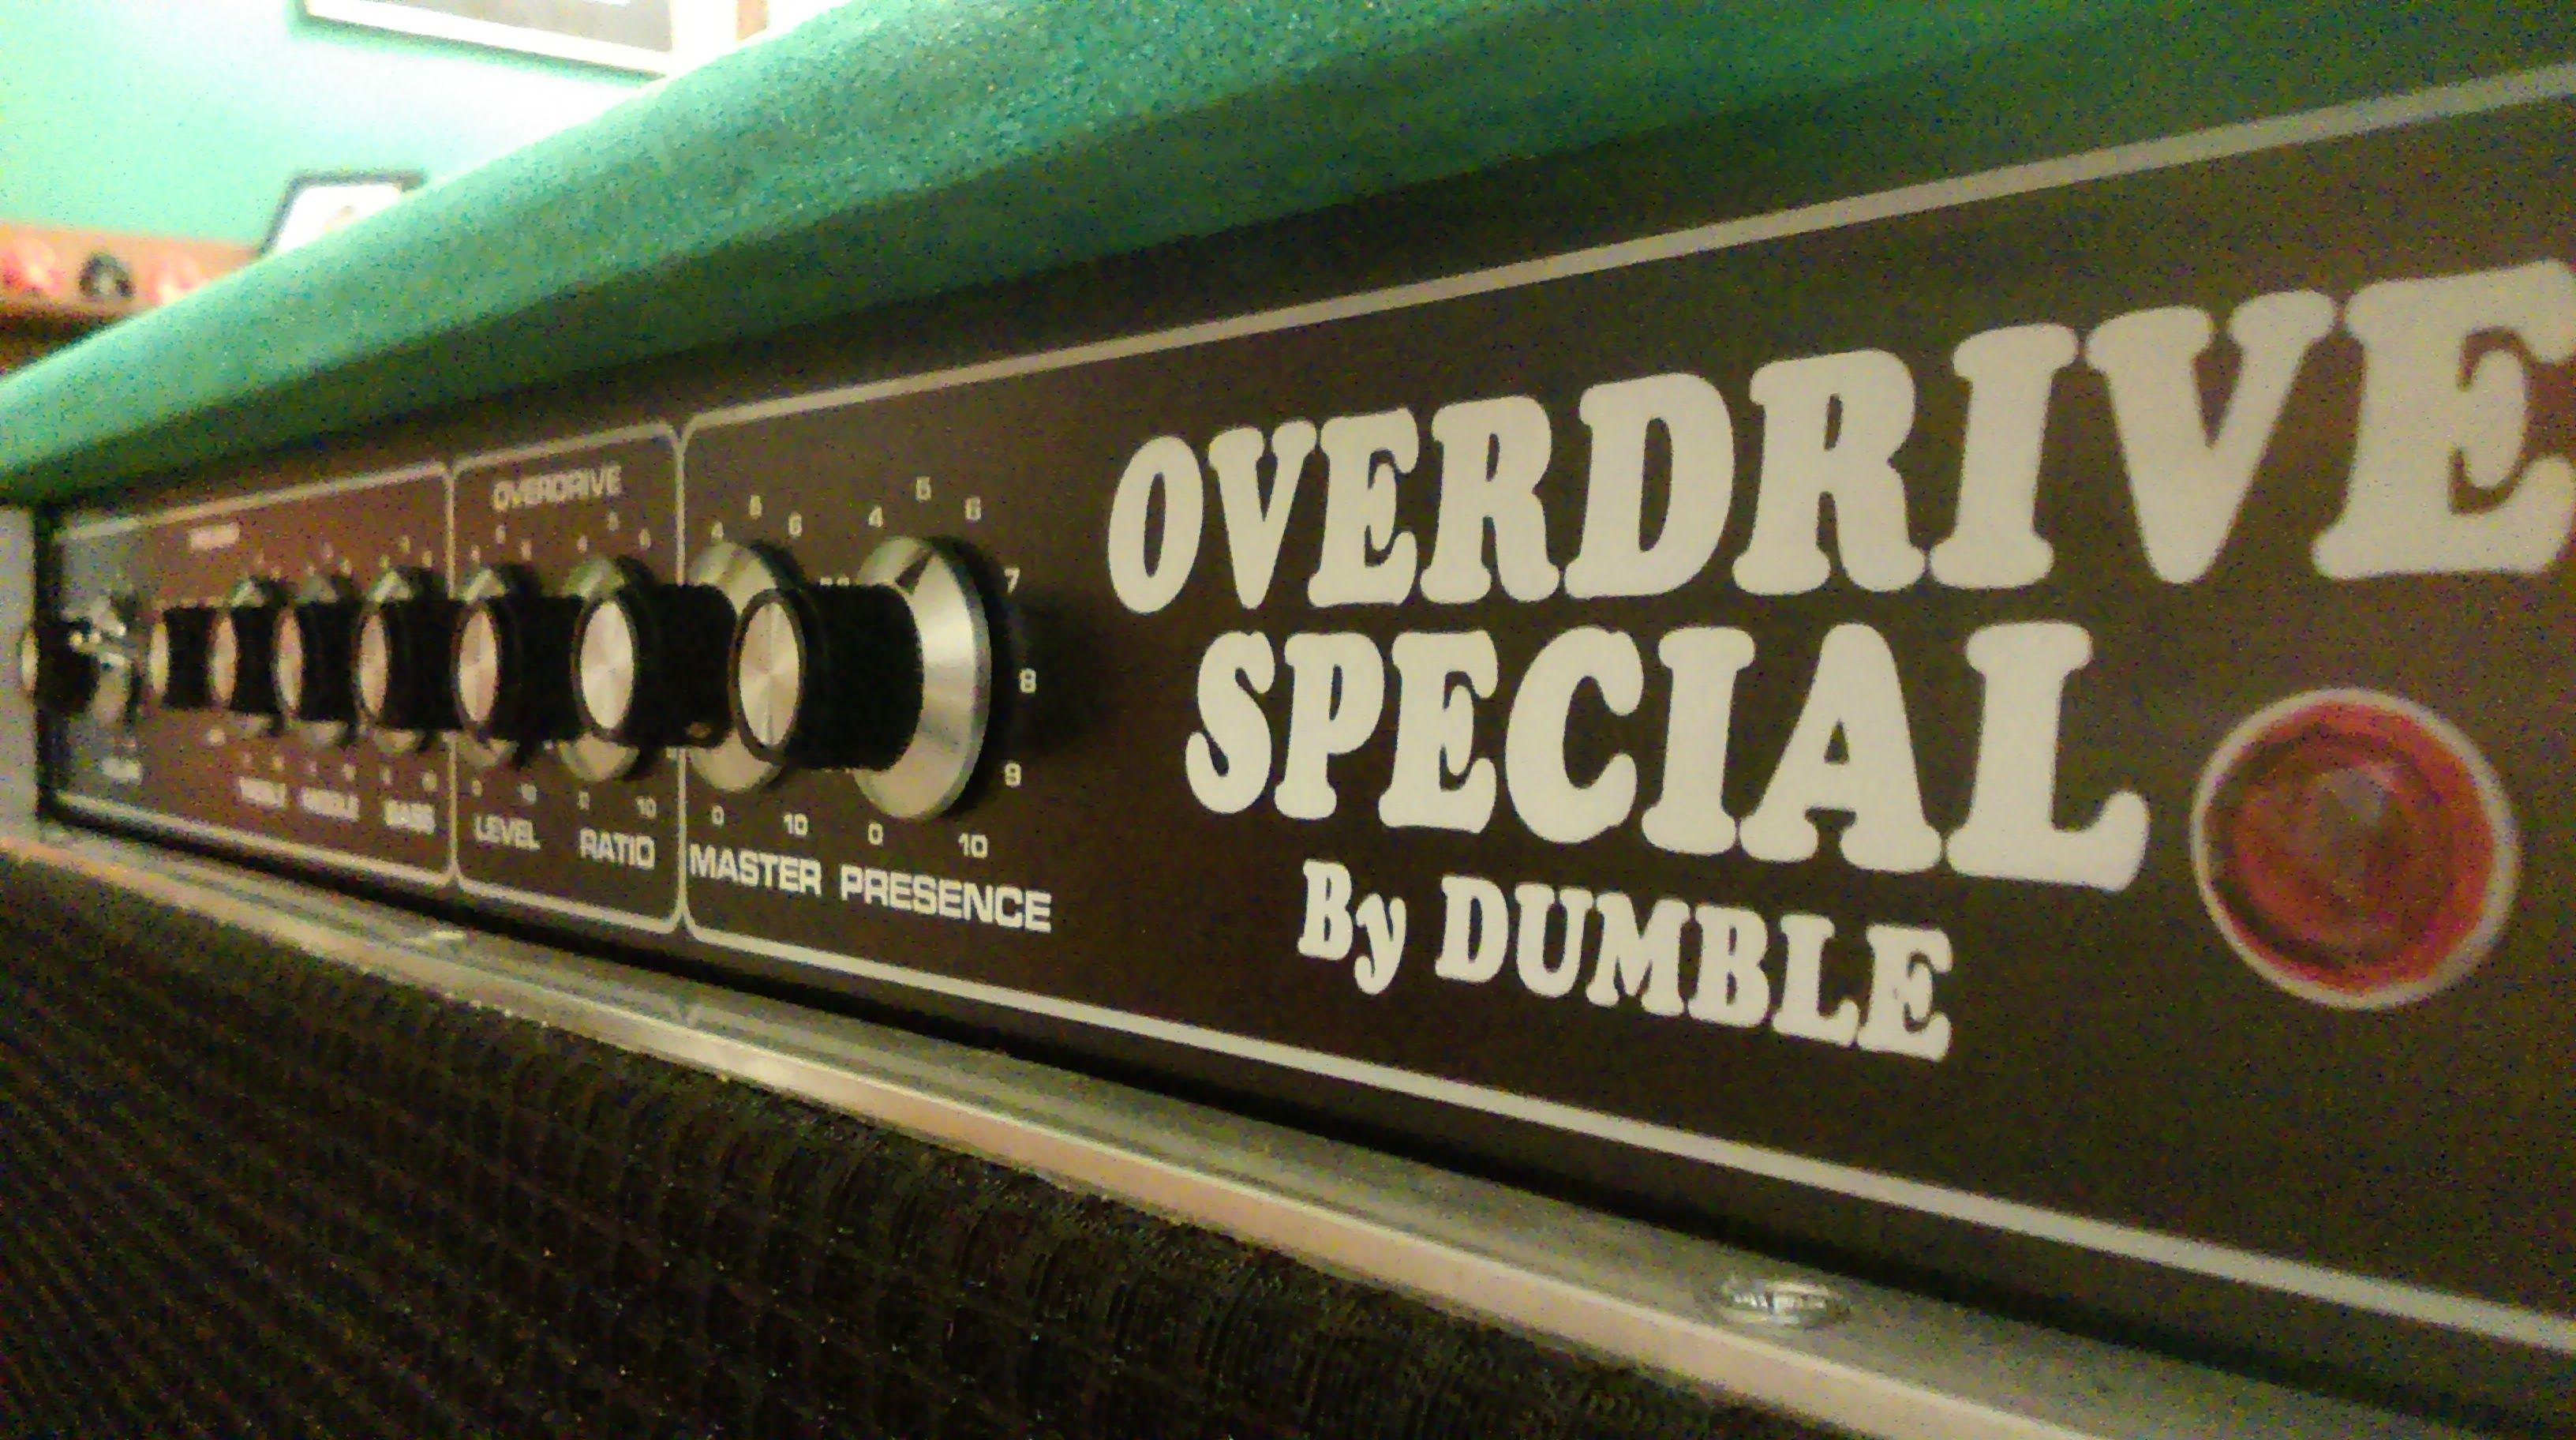 Dumble Speaker Cabinet Dumble Ods Overdrivespecial Amps Rigs Pinterest